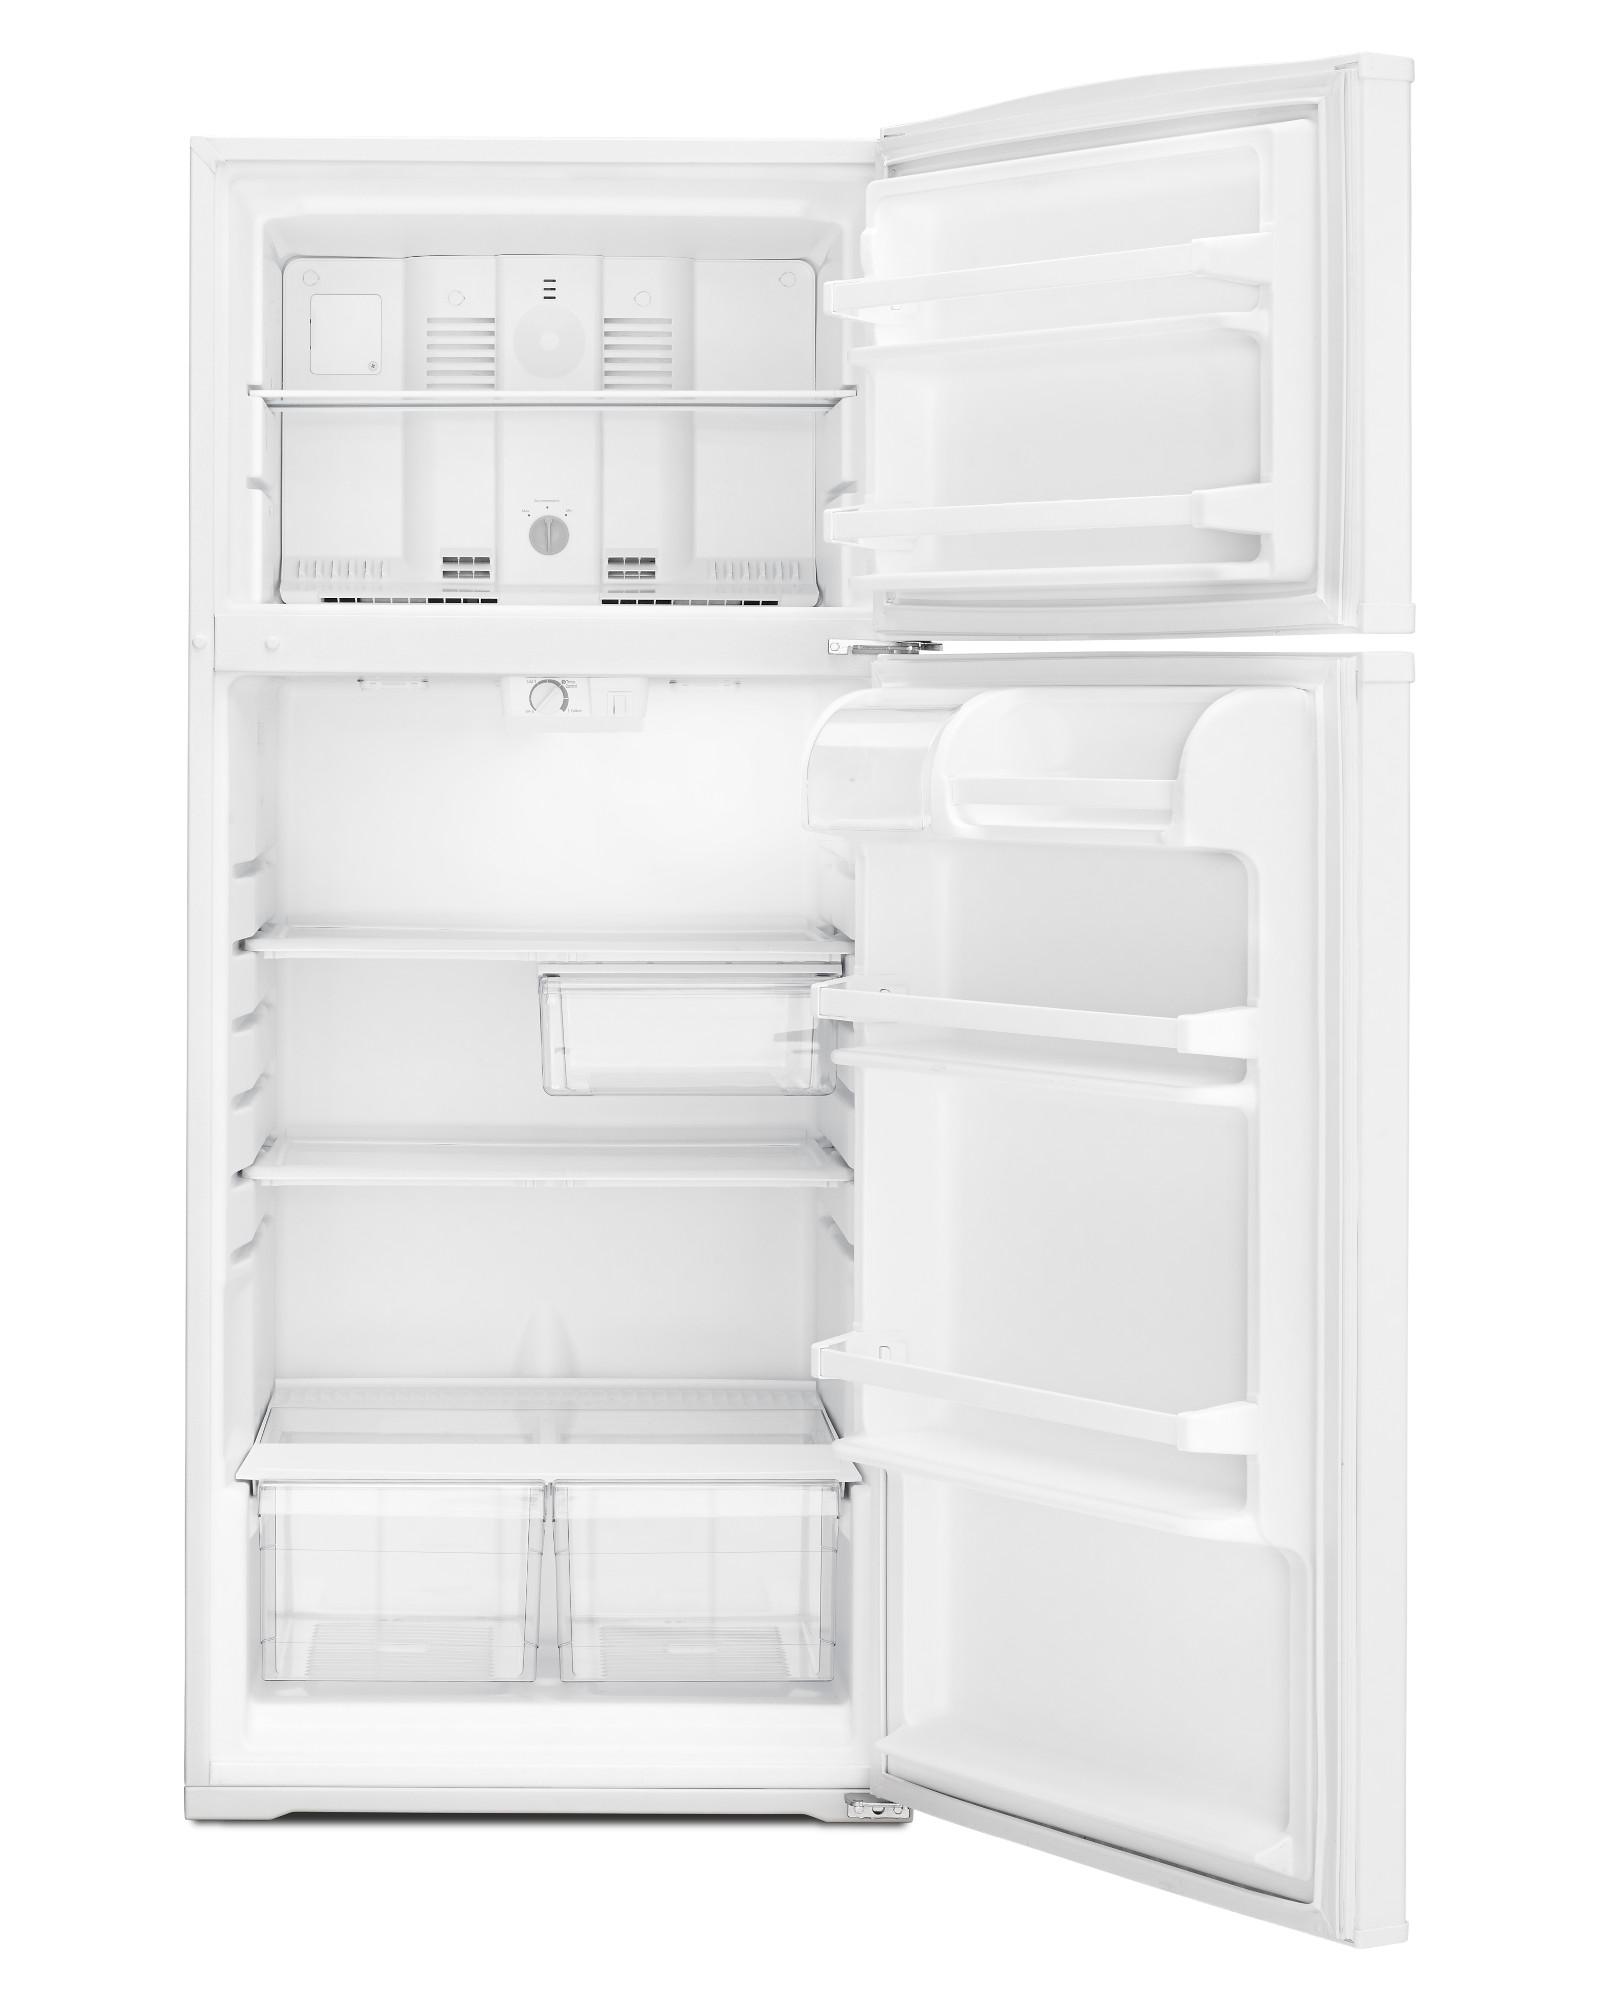 Whirlpool WRT316SFDW 16 cu. ft. Top Freezer Refrigerator - White